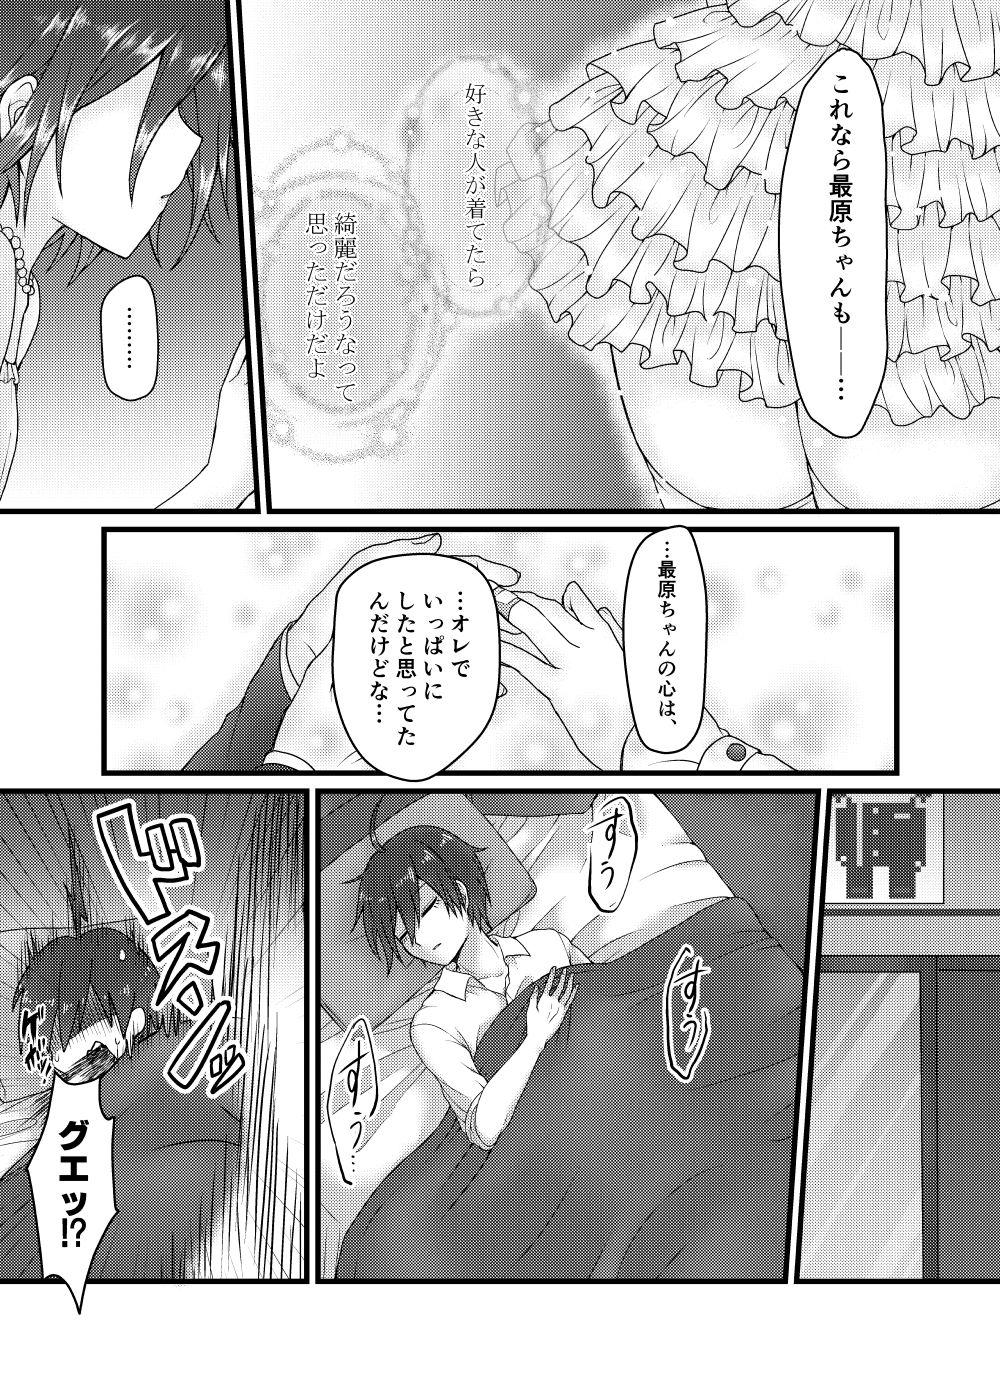 Usotsuki Hanayome 13